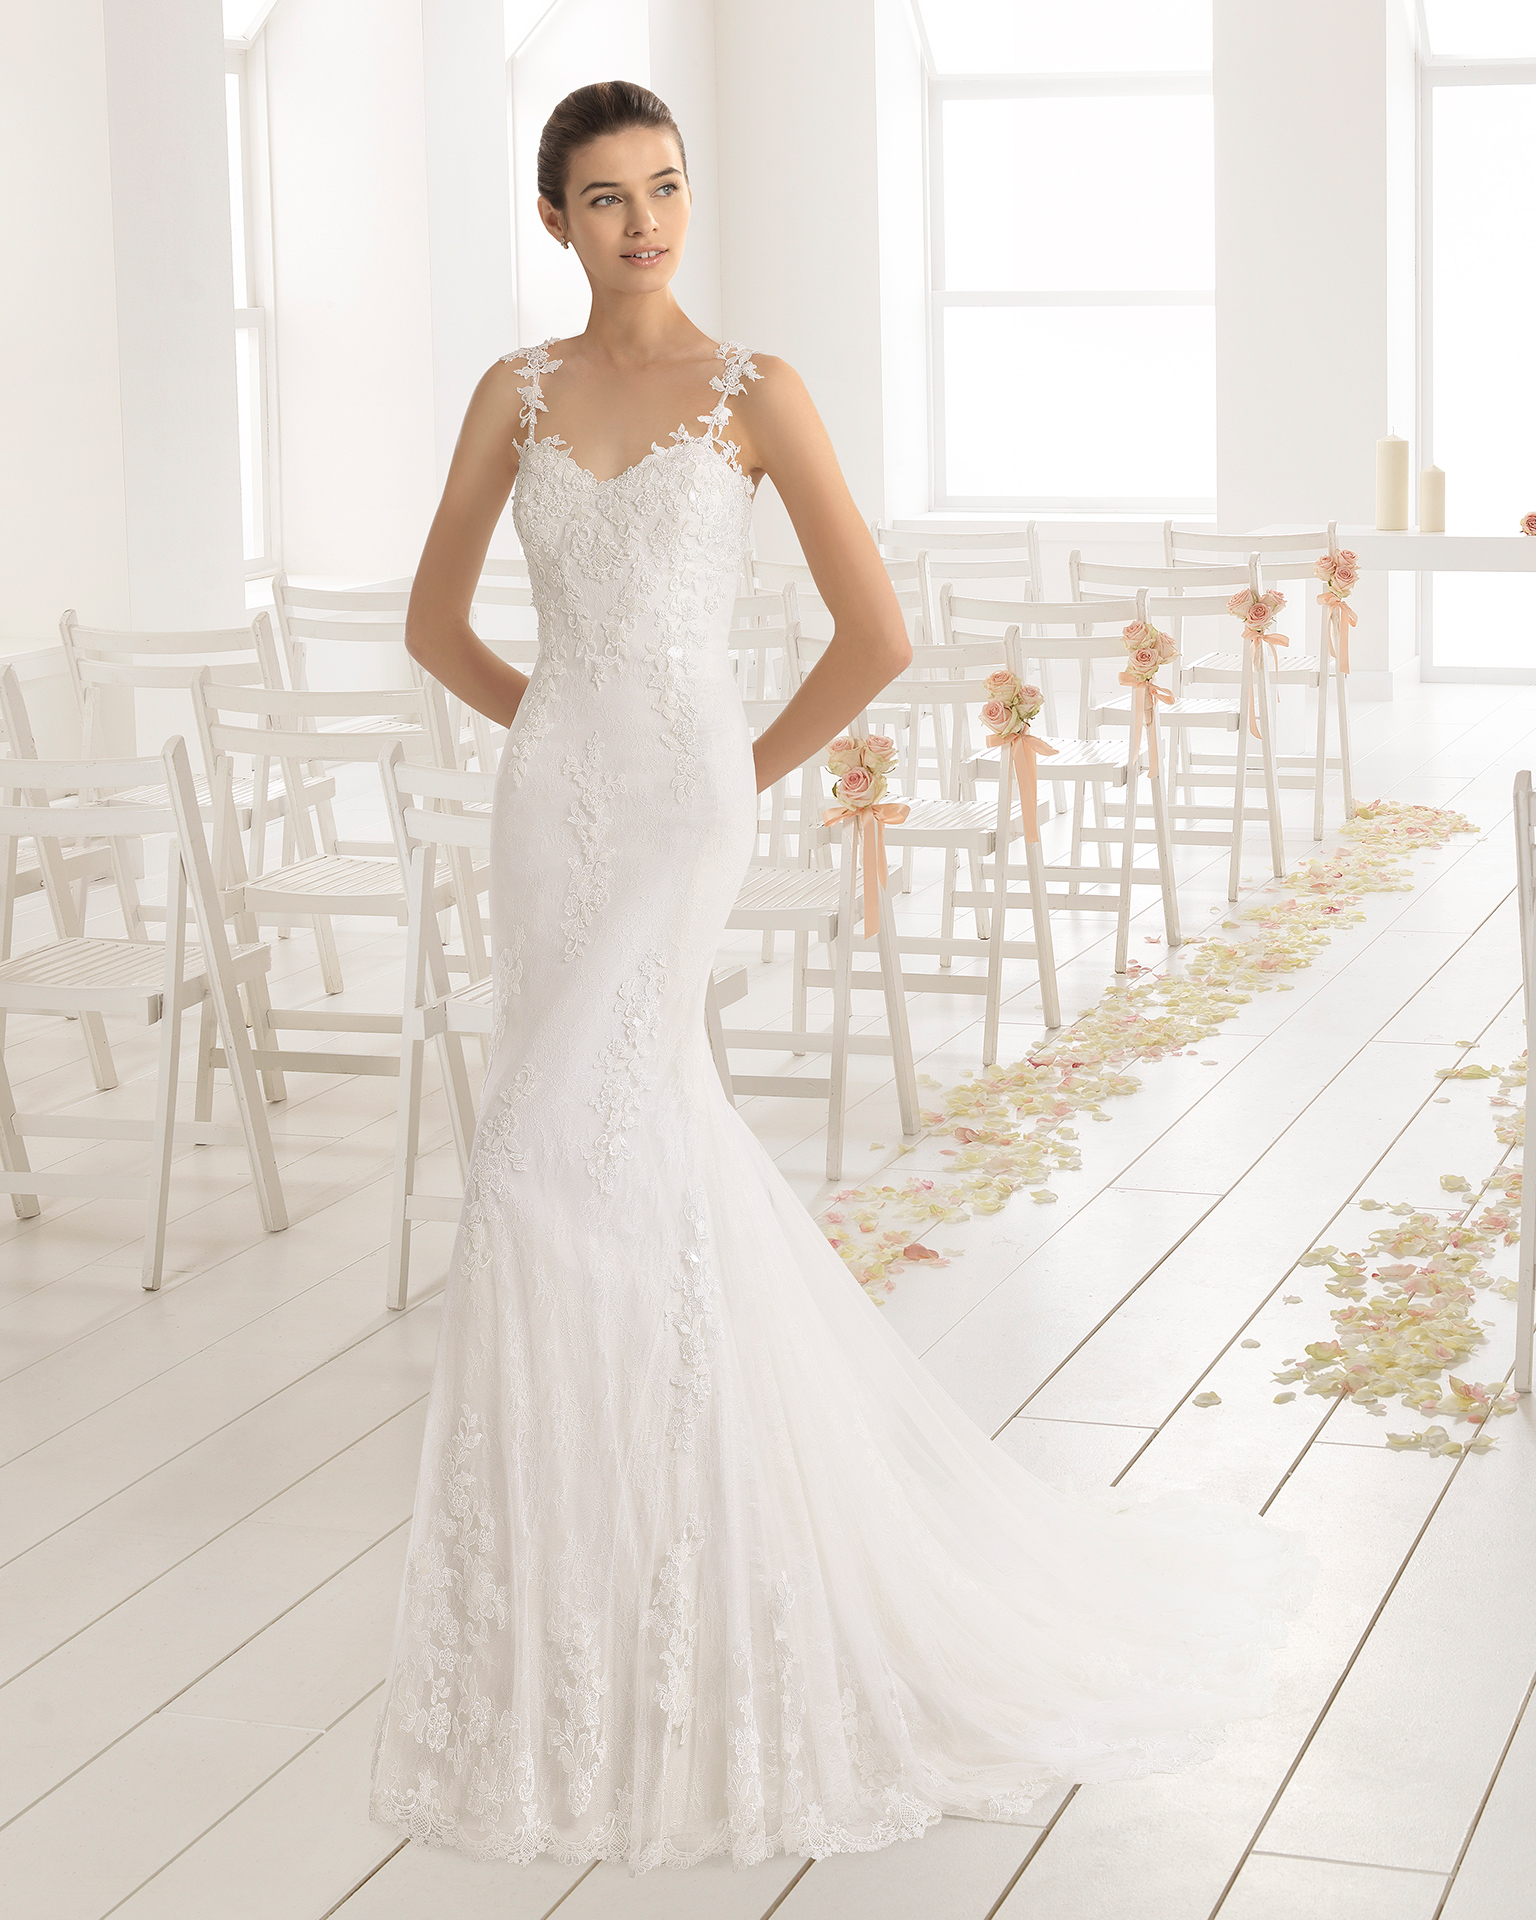 Tiendas vestidos de novia en mallorca